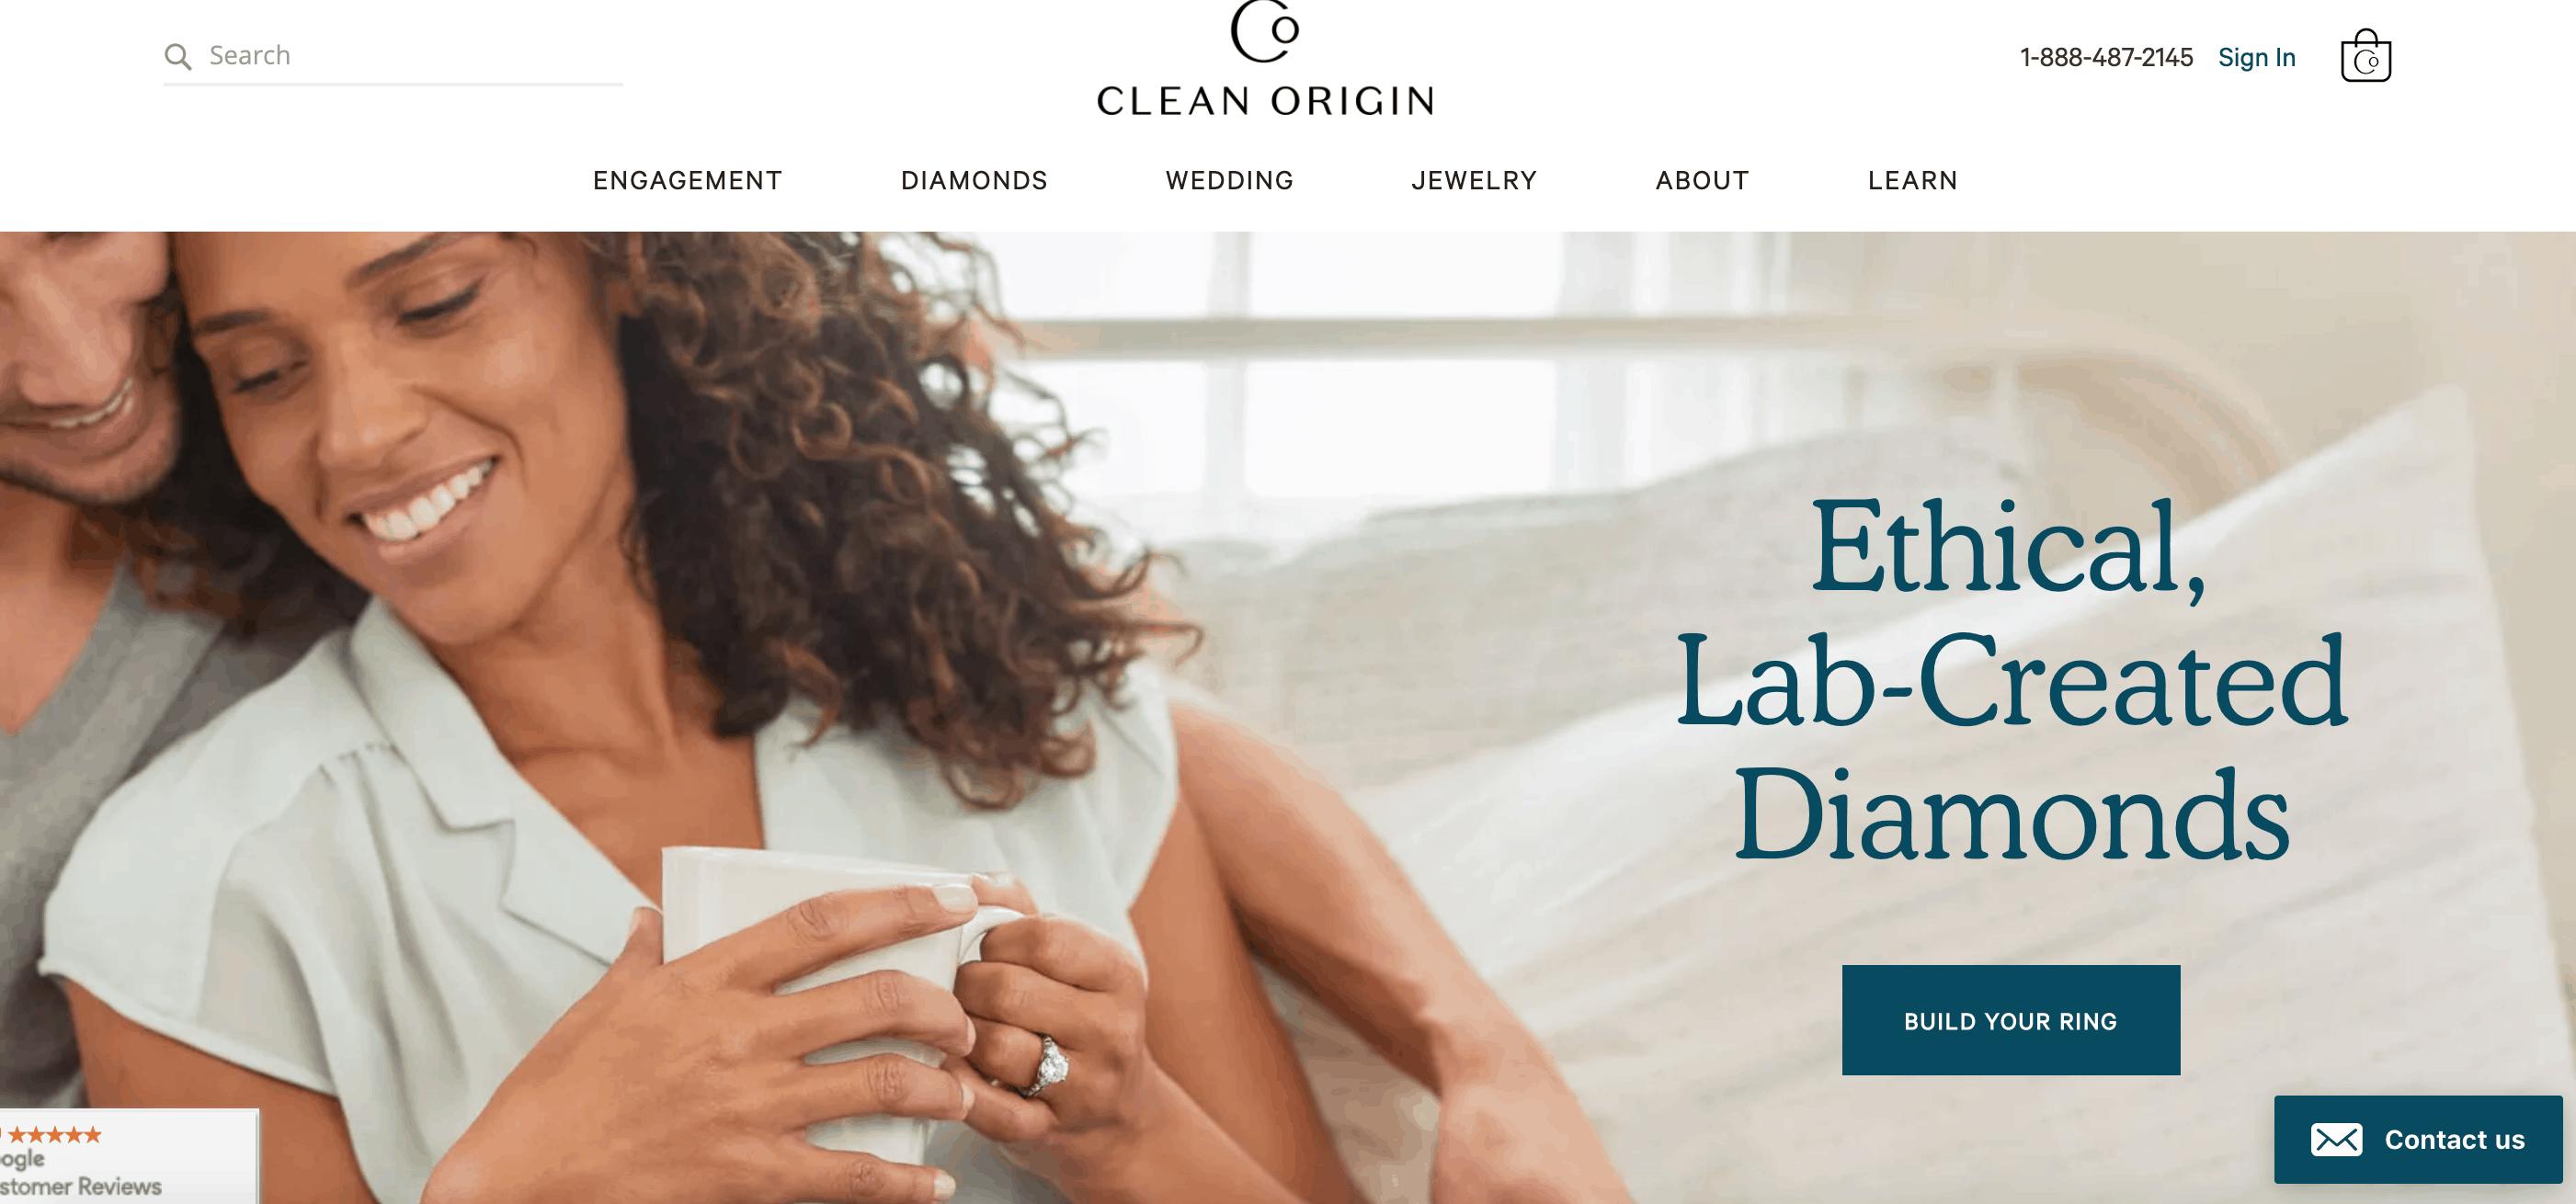 clean origin website